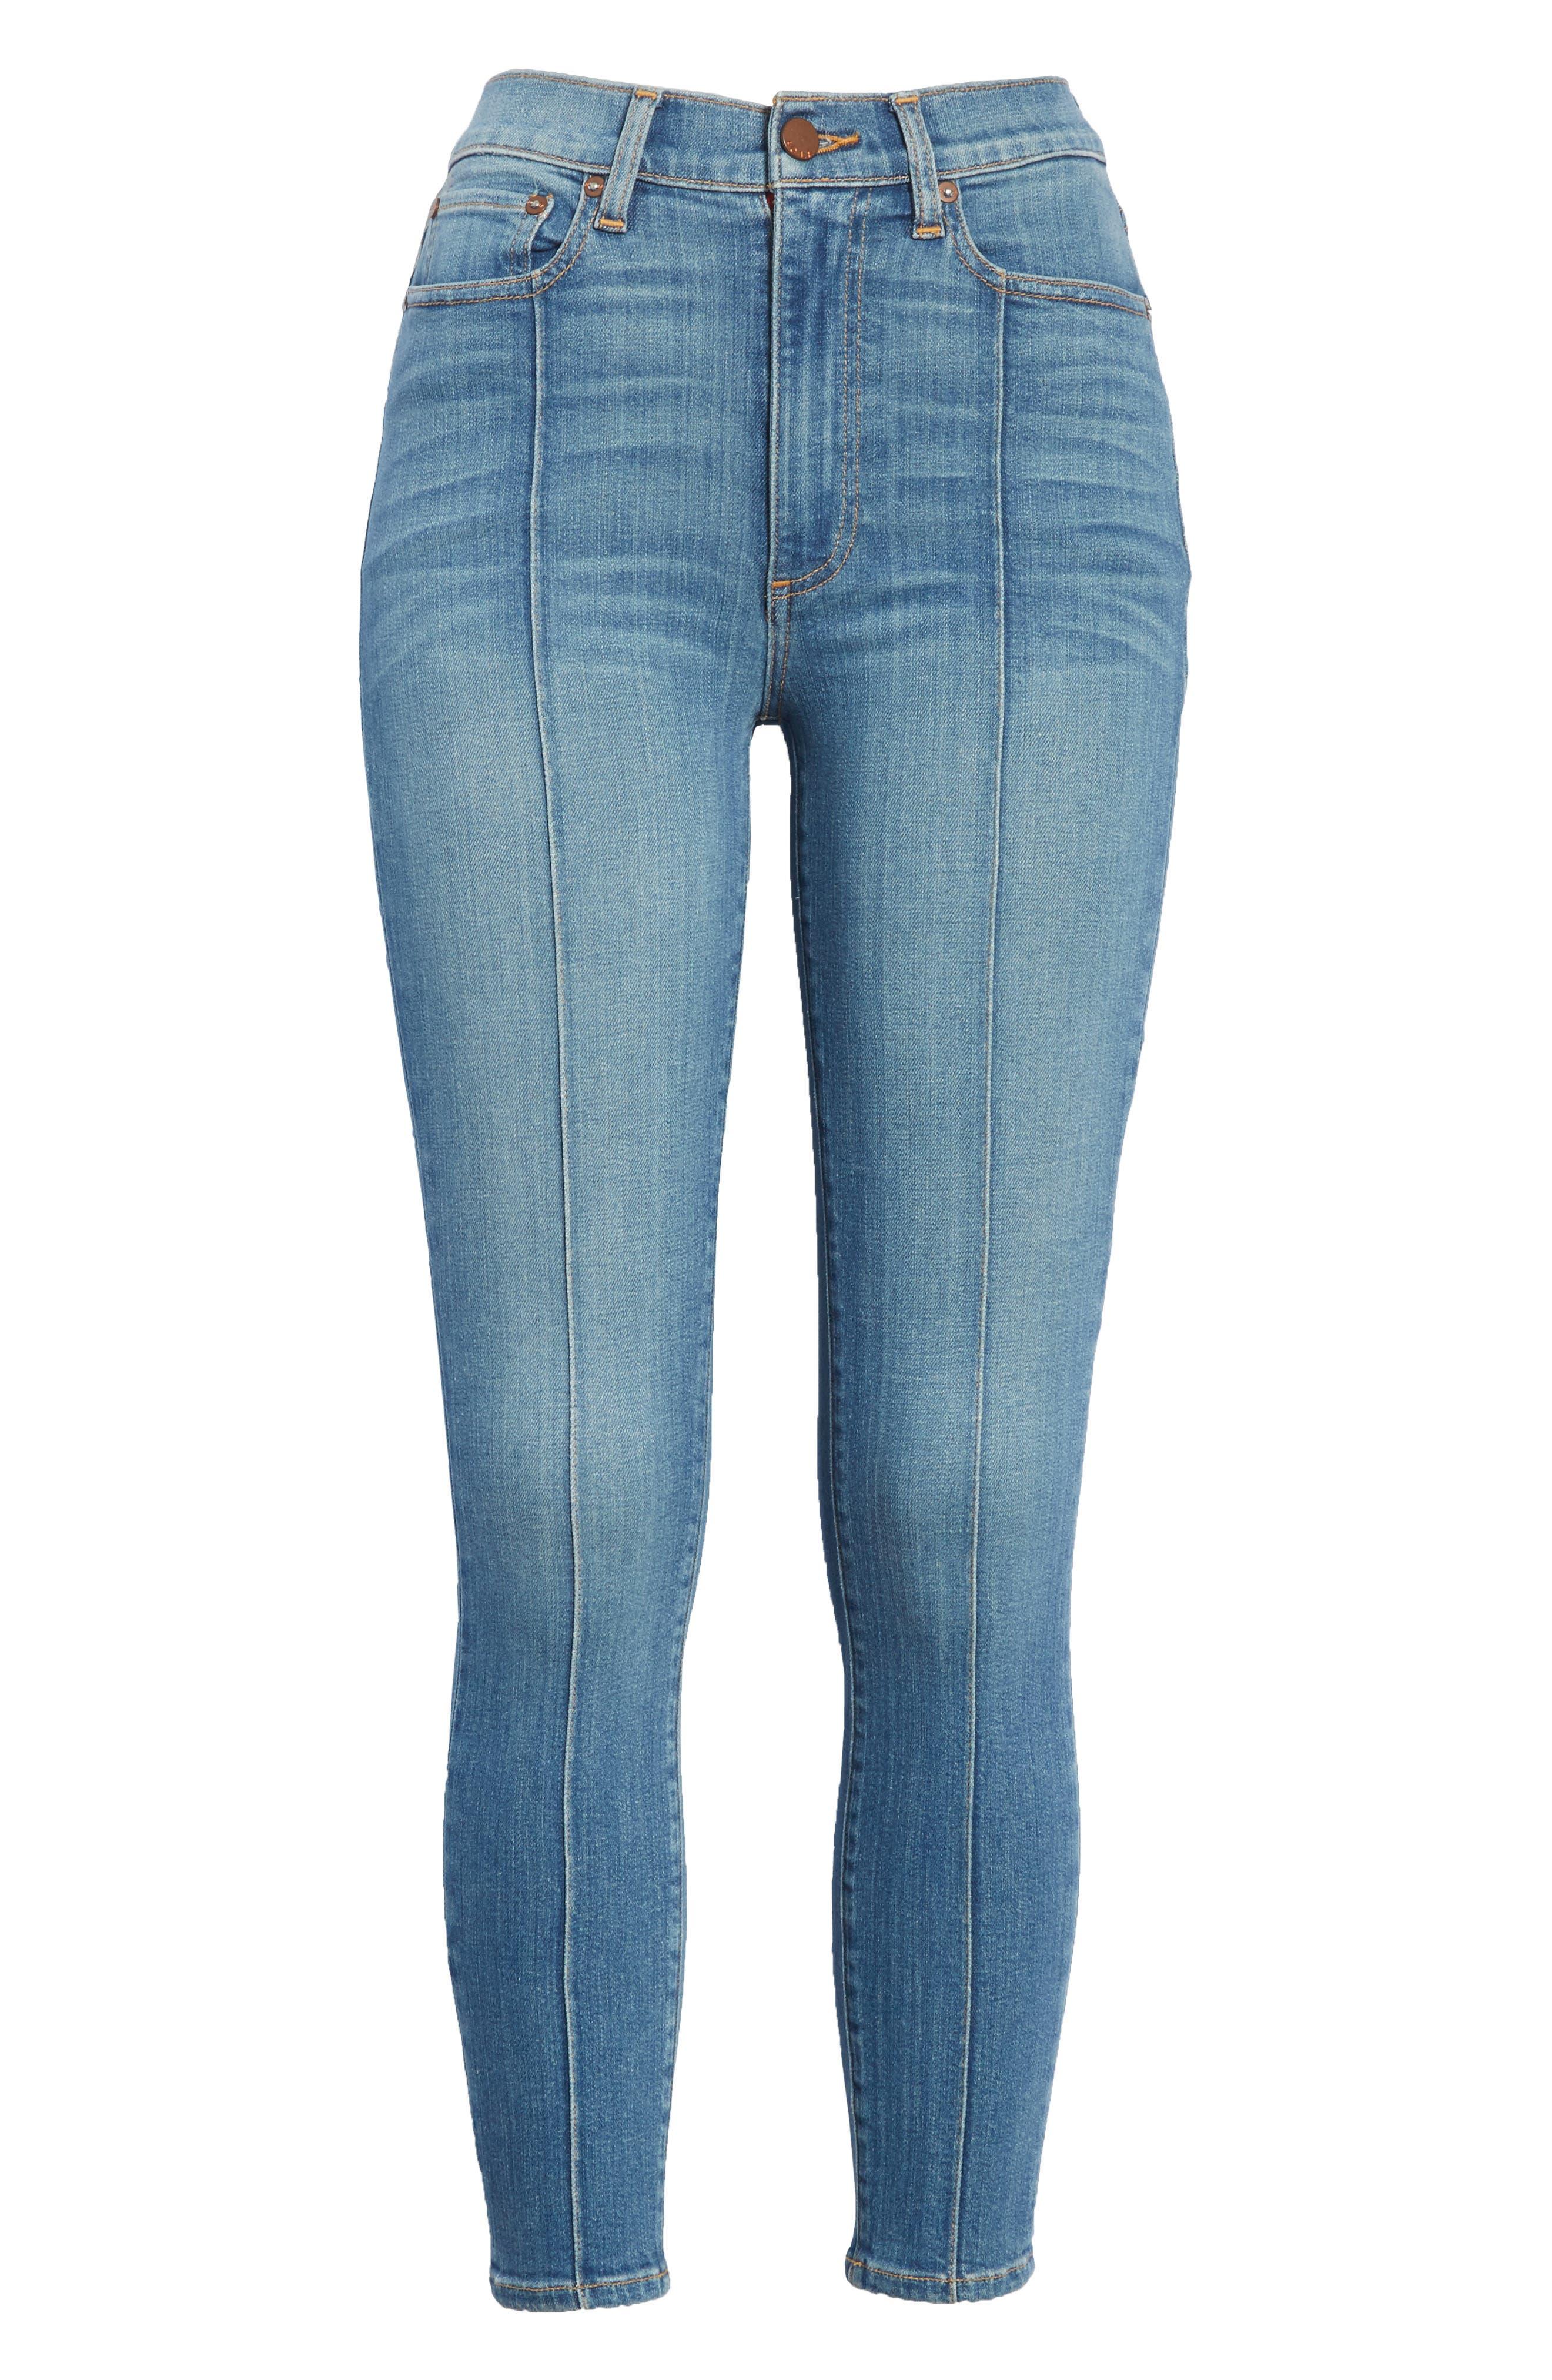 AO.LA Good High Waist Pintuck Skinny Jeans,                             Alternate thumbnail 6, color,                             482